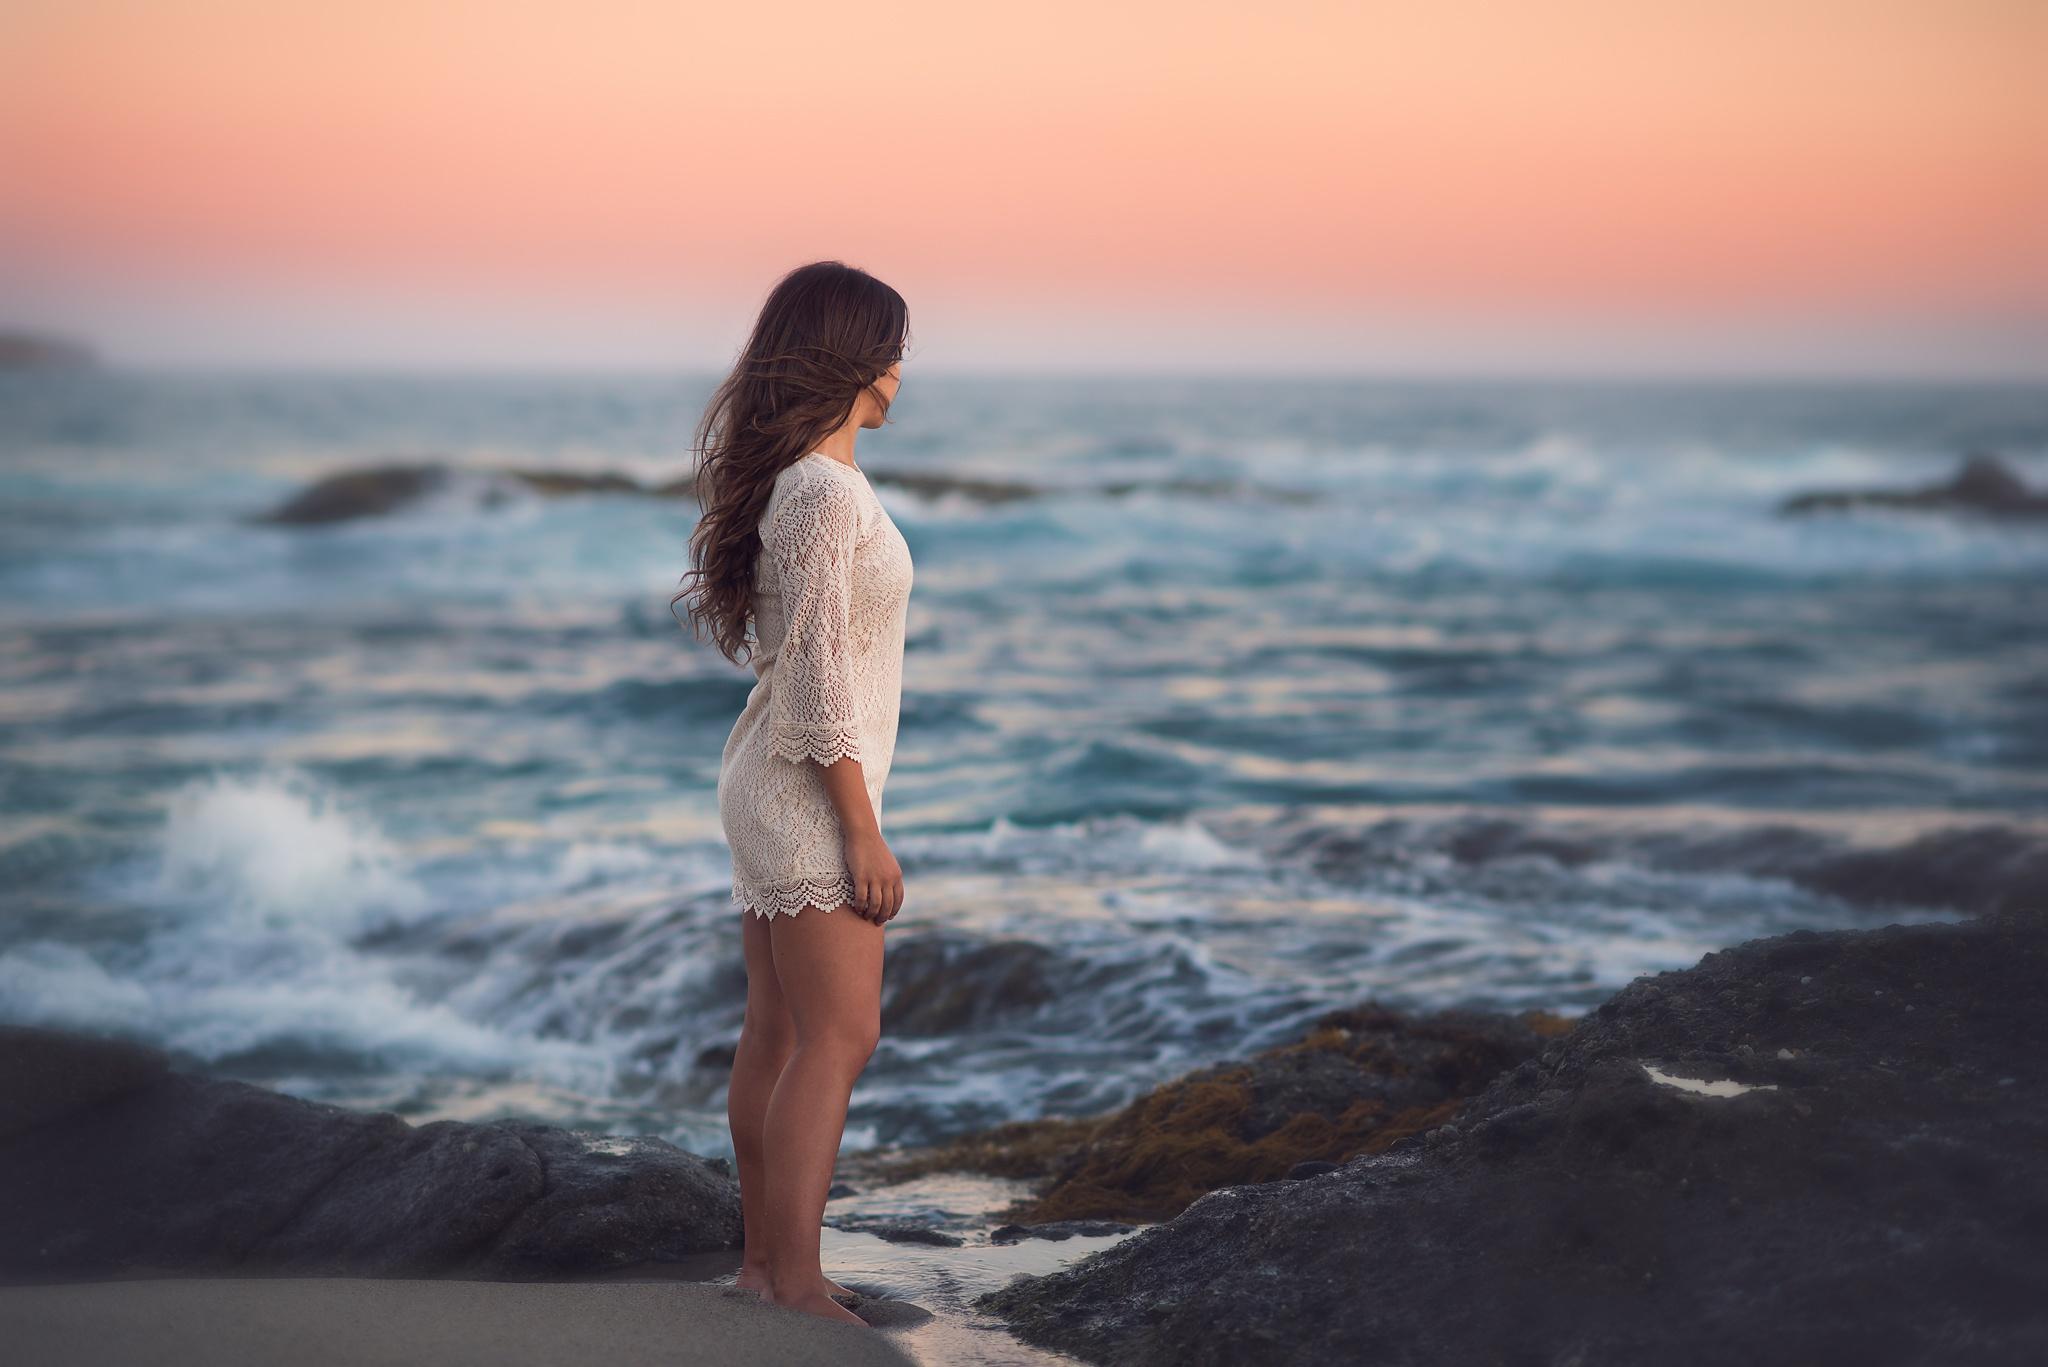 фото где девушка сидит на море жить